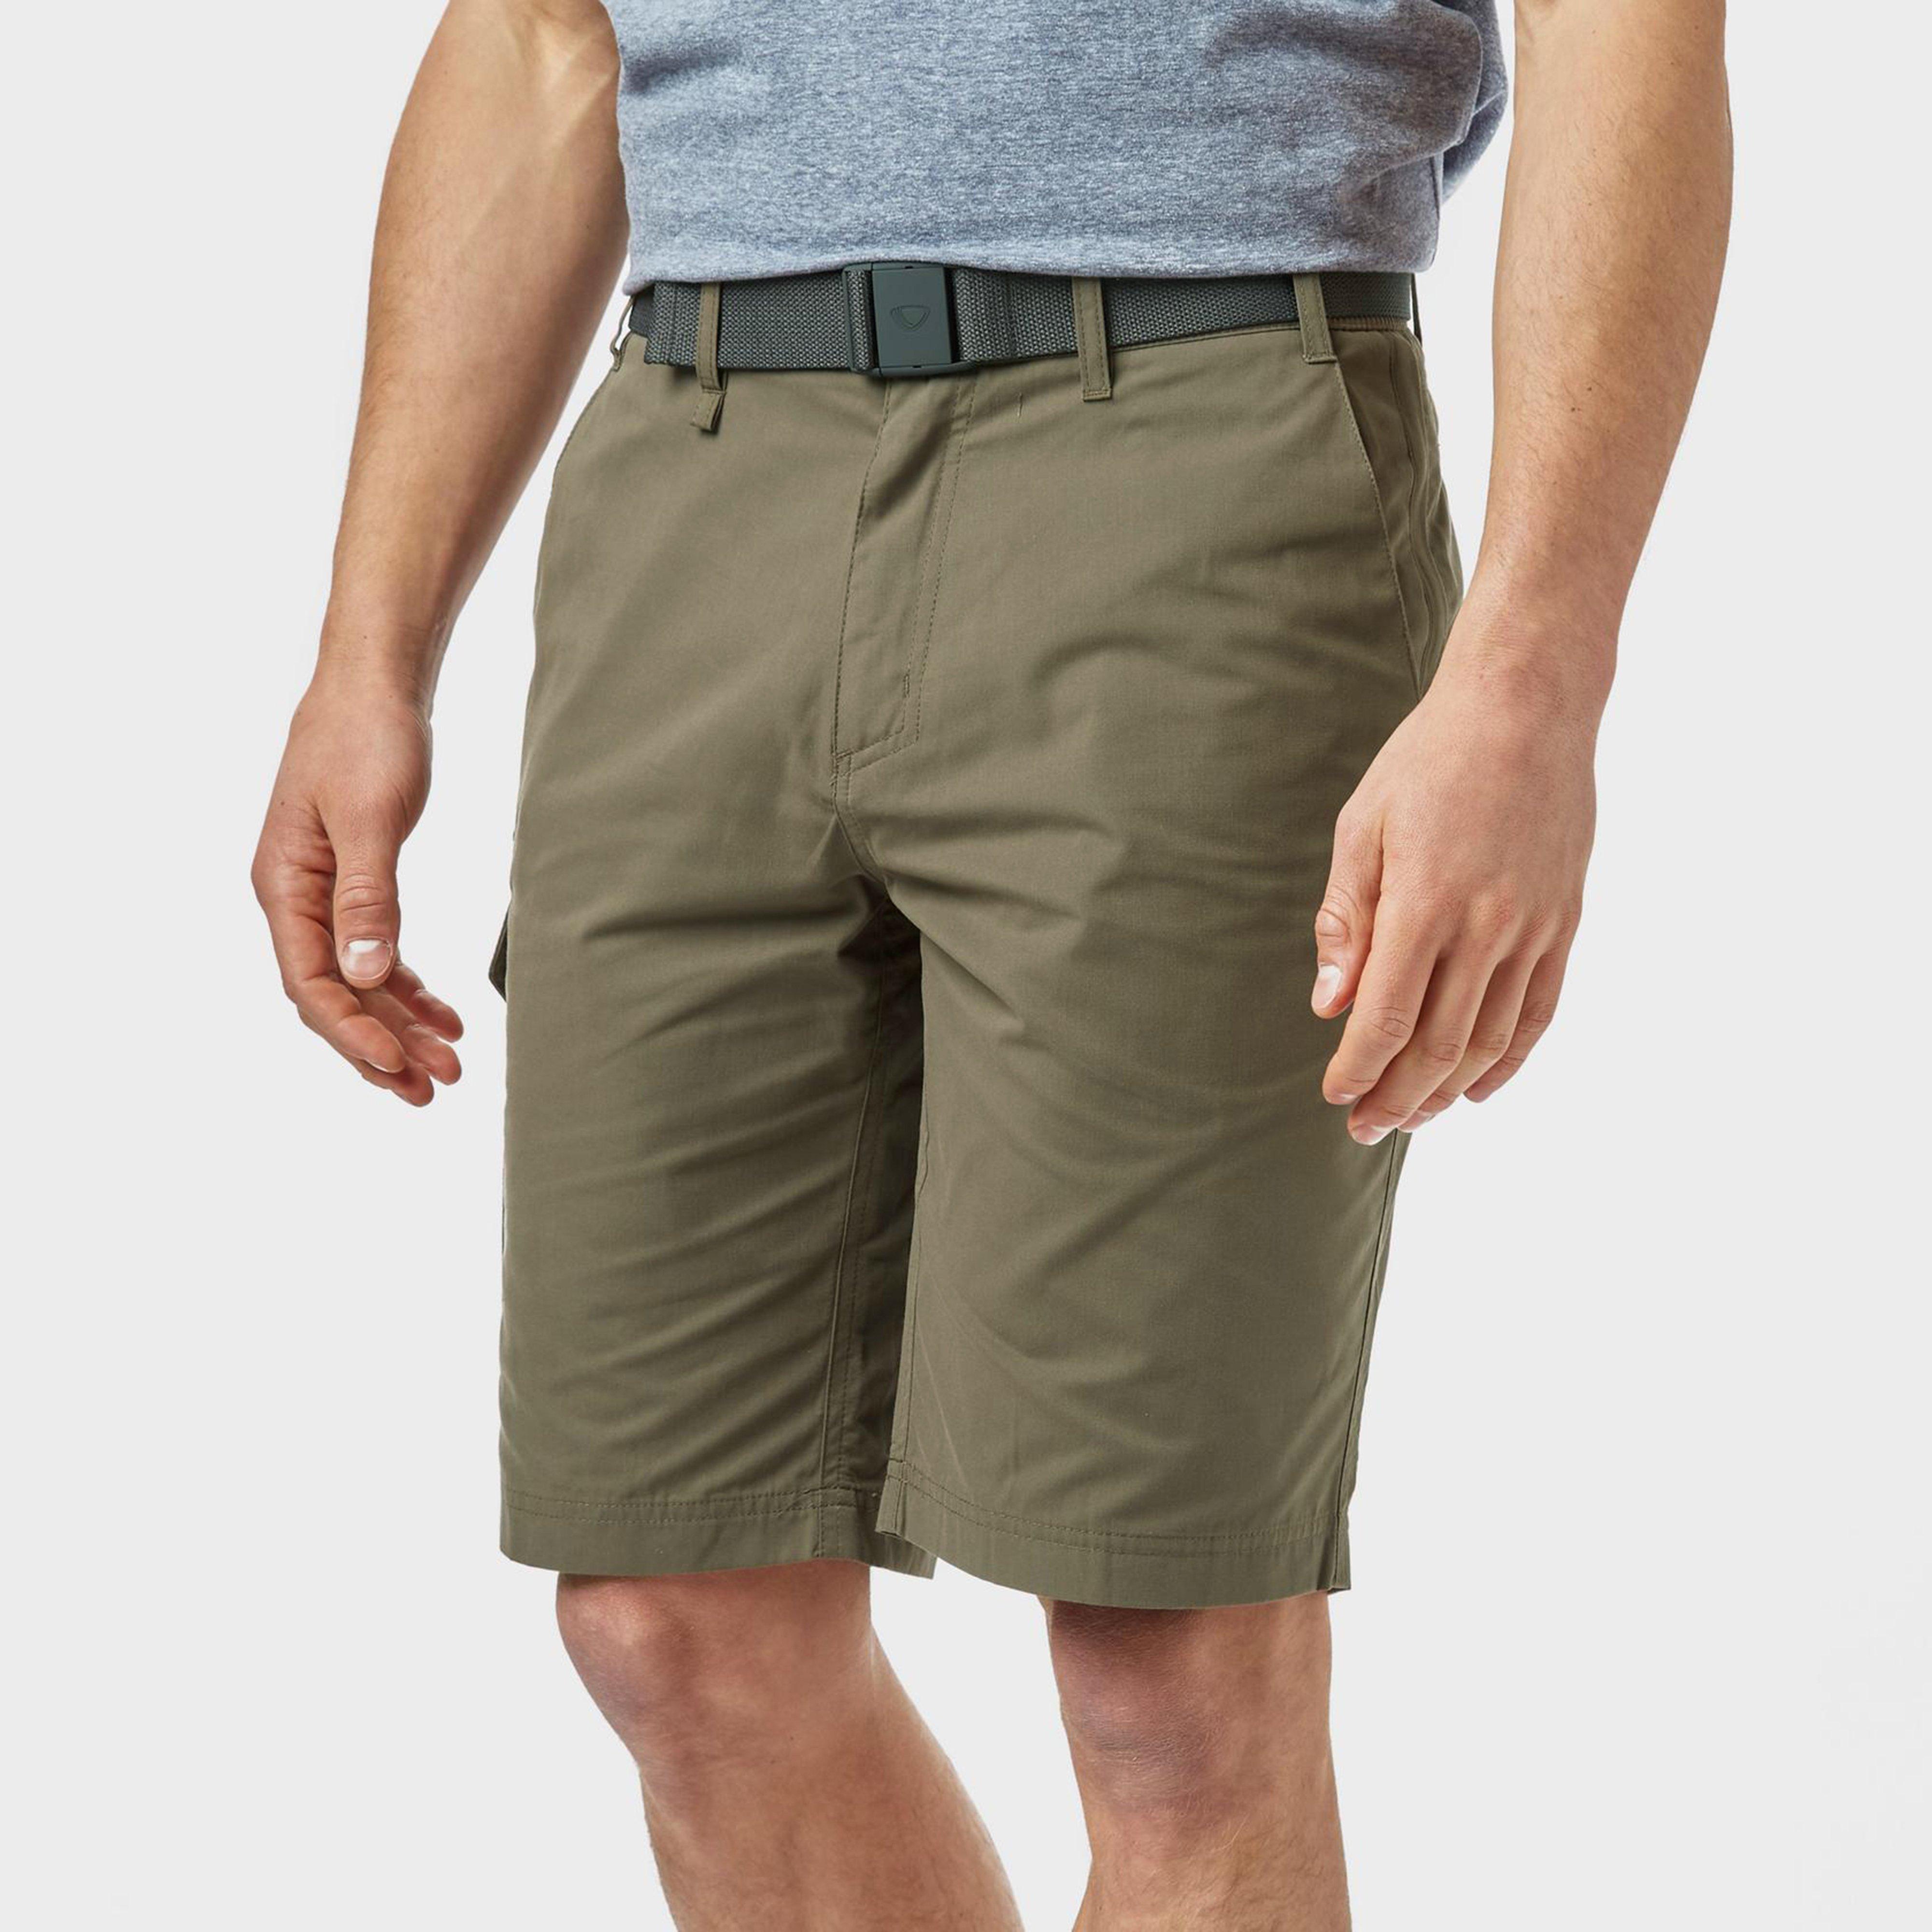 Brasher Mens Shorts - Brown/brown  Brown/brown